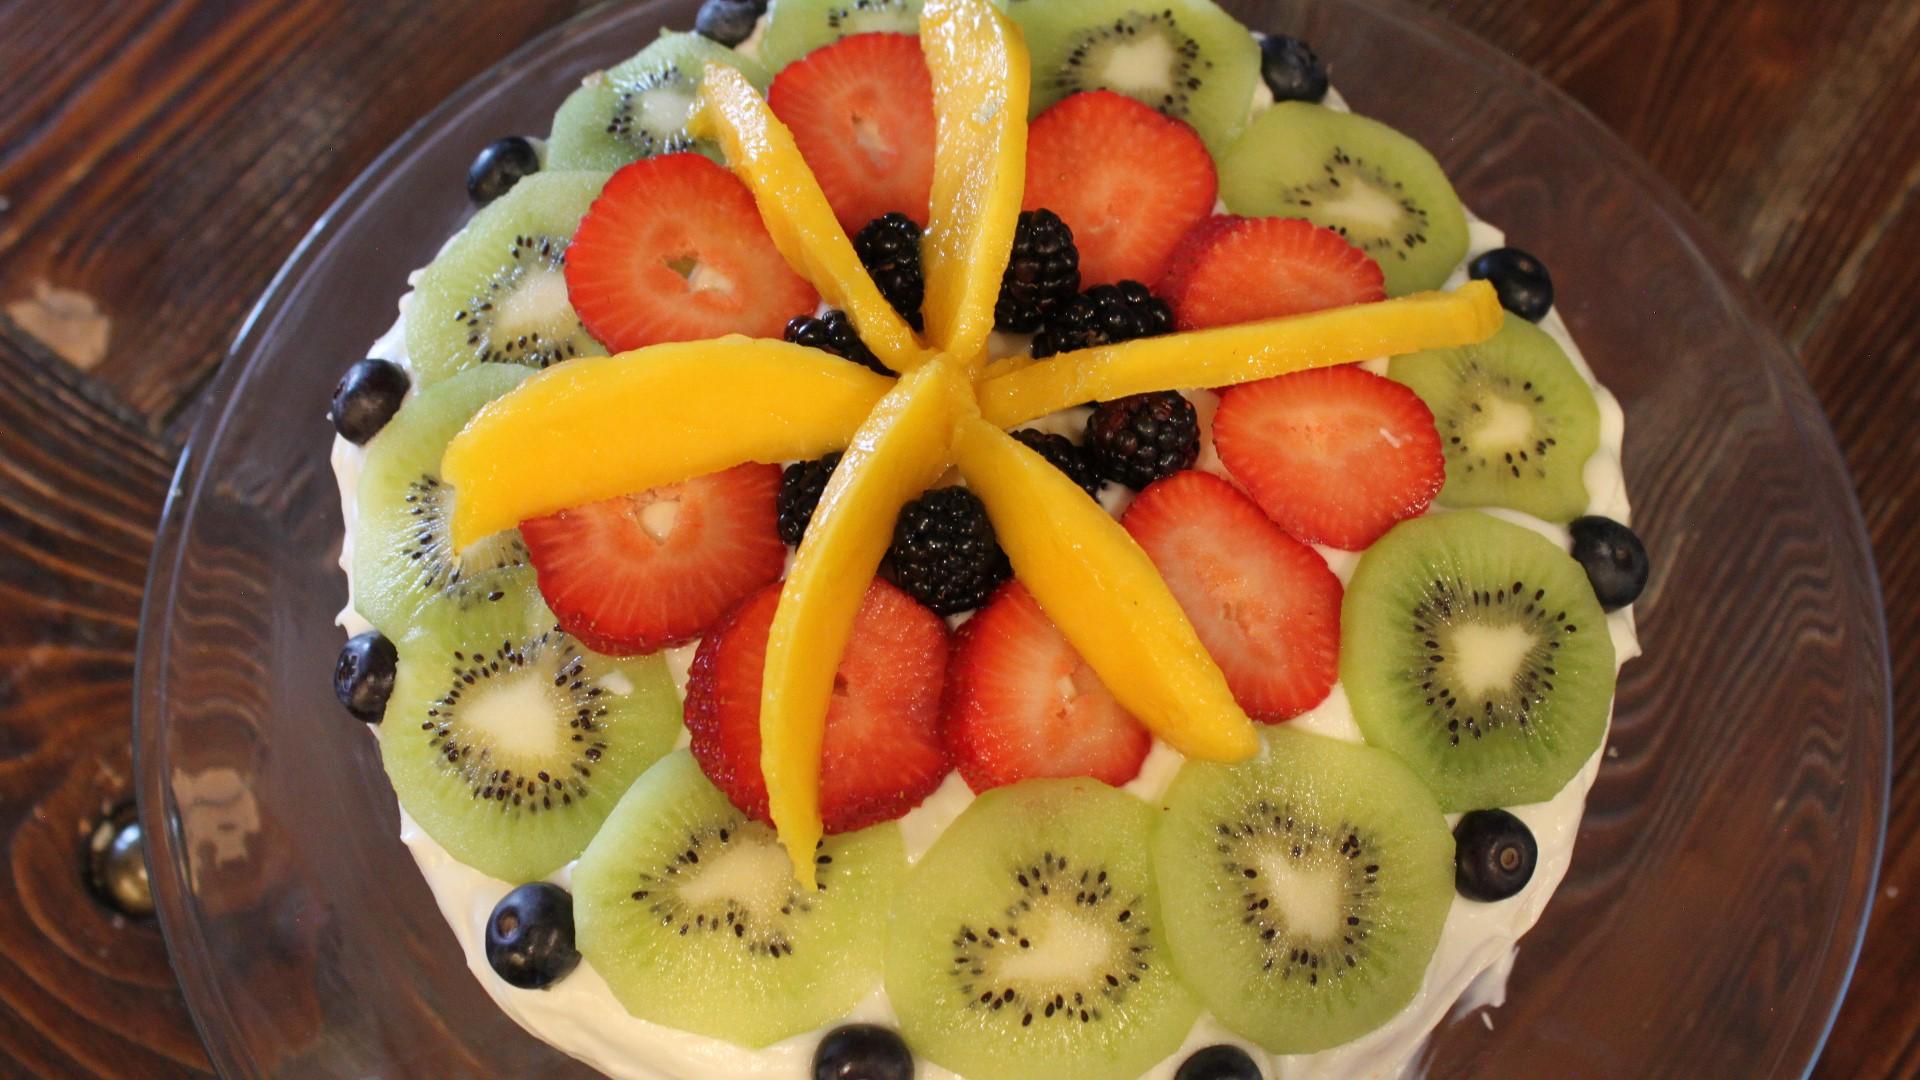 Fantastic The Markets Spring Fling Cake Recipe 9News Com Funny Birthday Cards Online Bapapcheapnameinfo